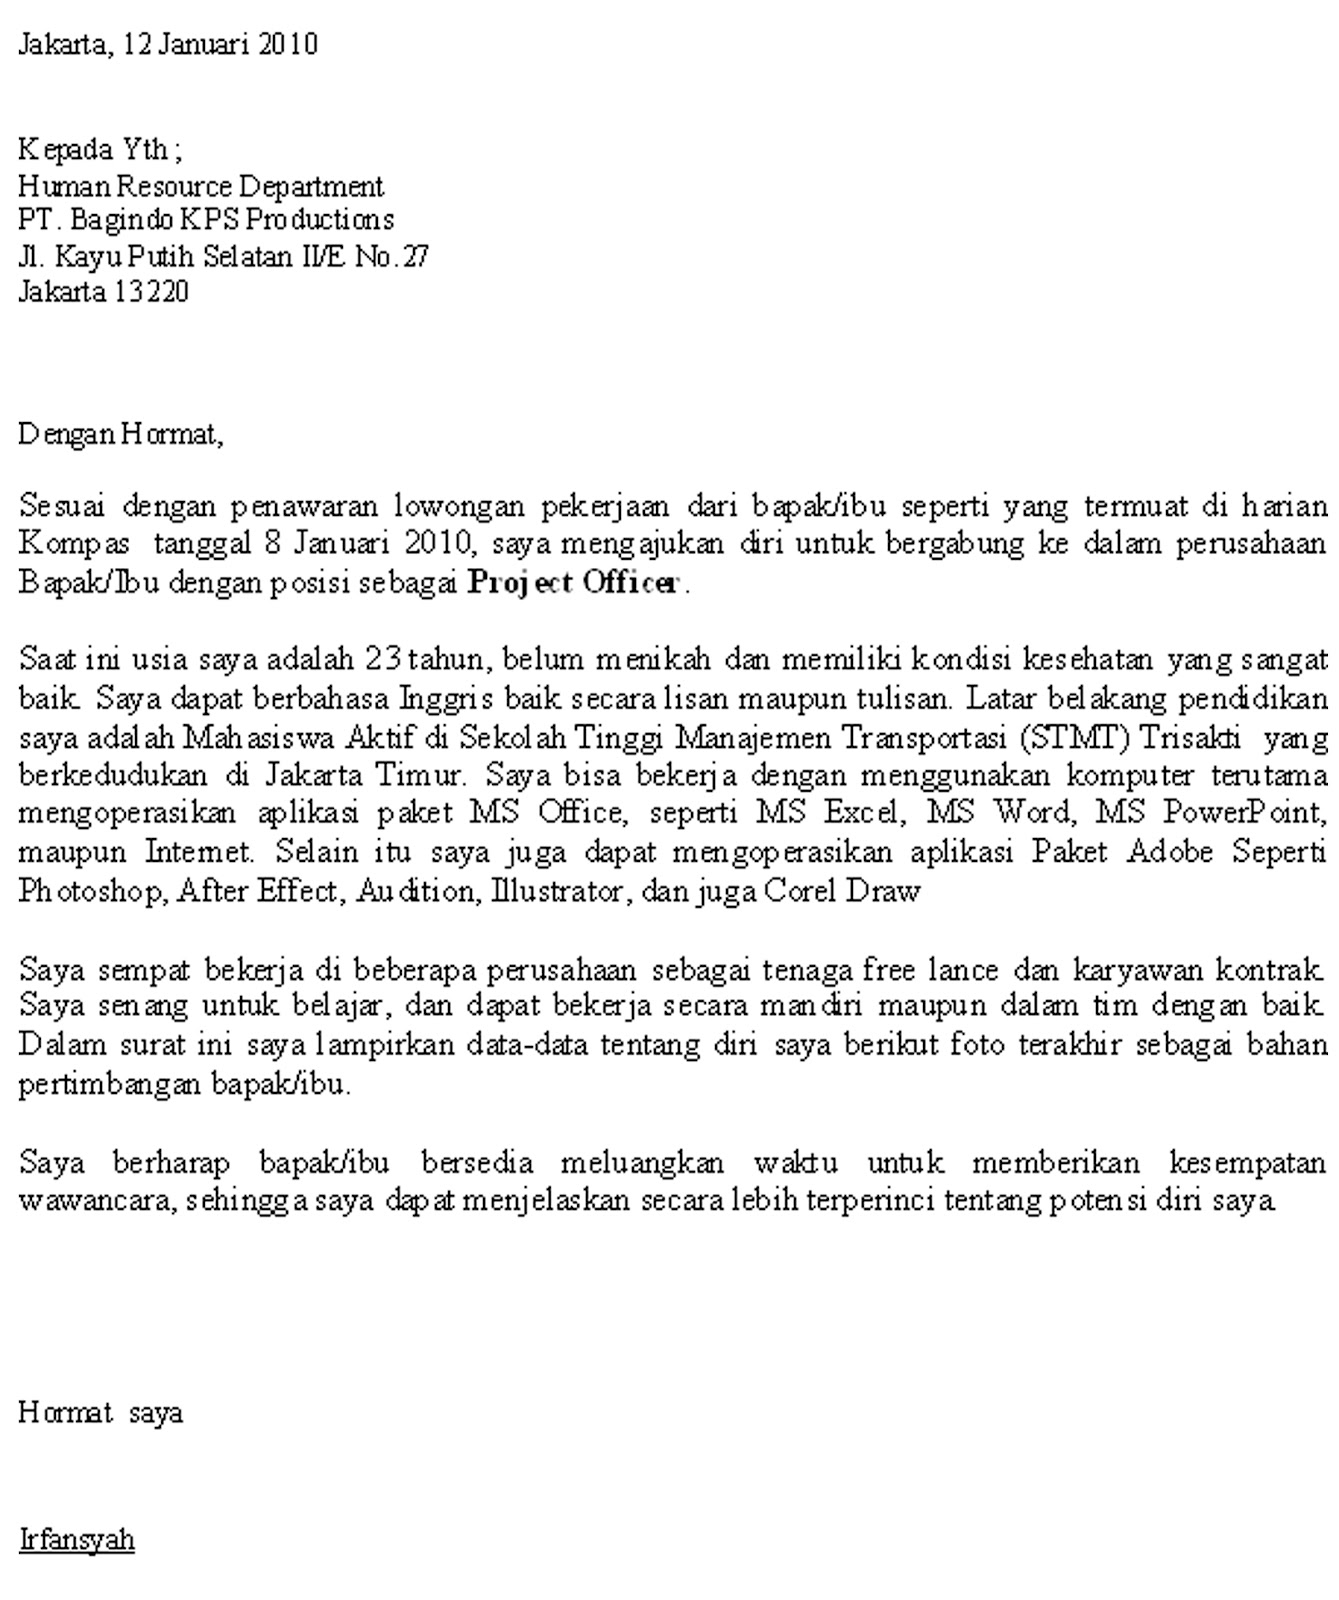 application letter dan cv profesional resume for job application letter dan cv home adam smith international contoh surat lamaran kerja bahasa inggris job application